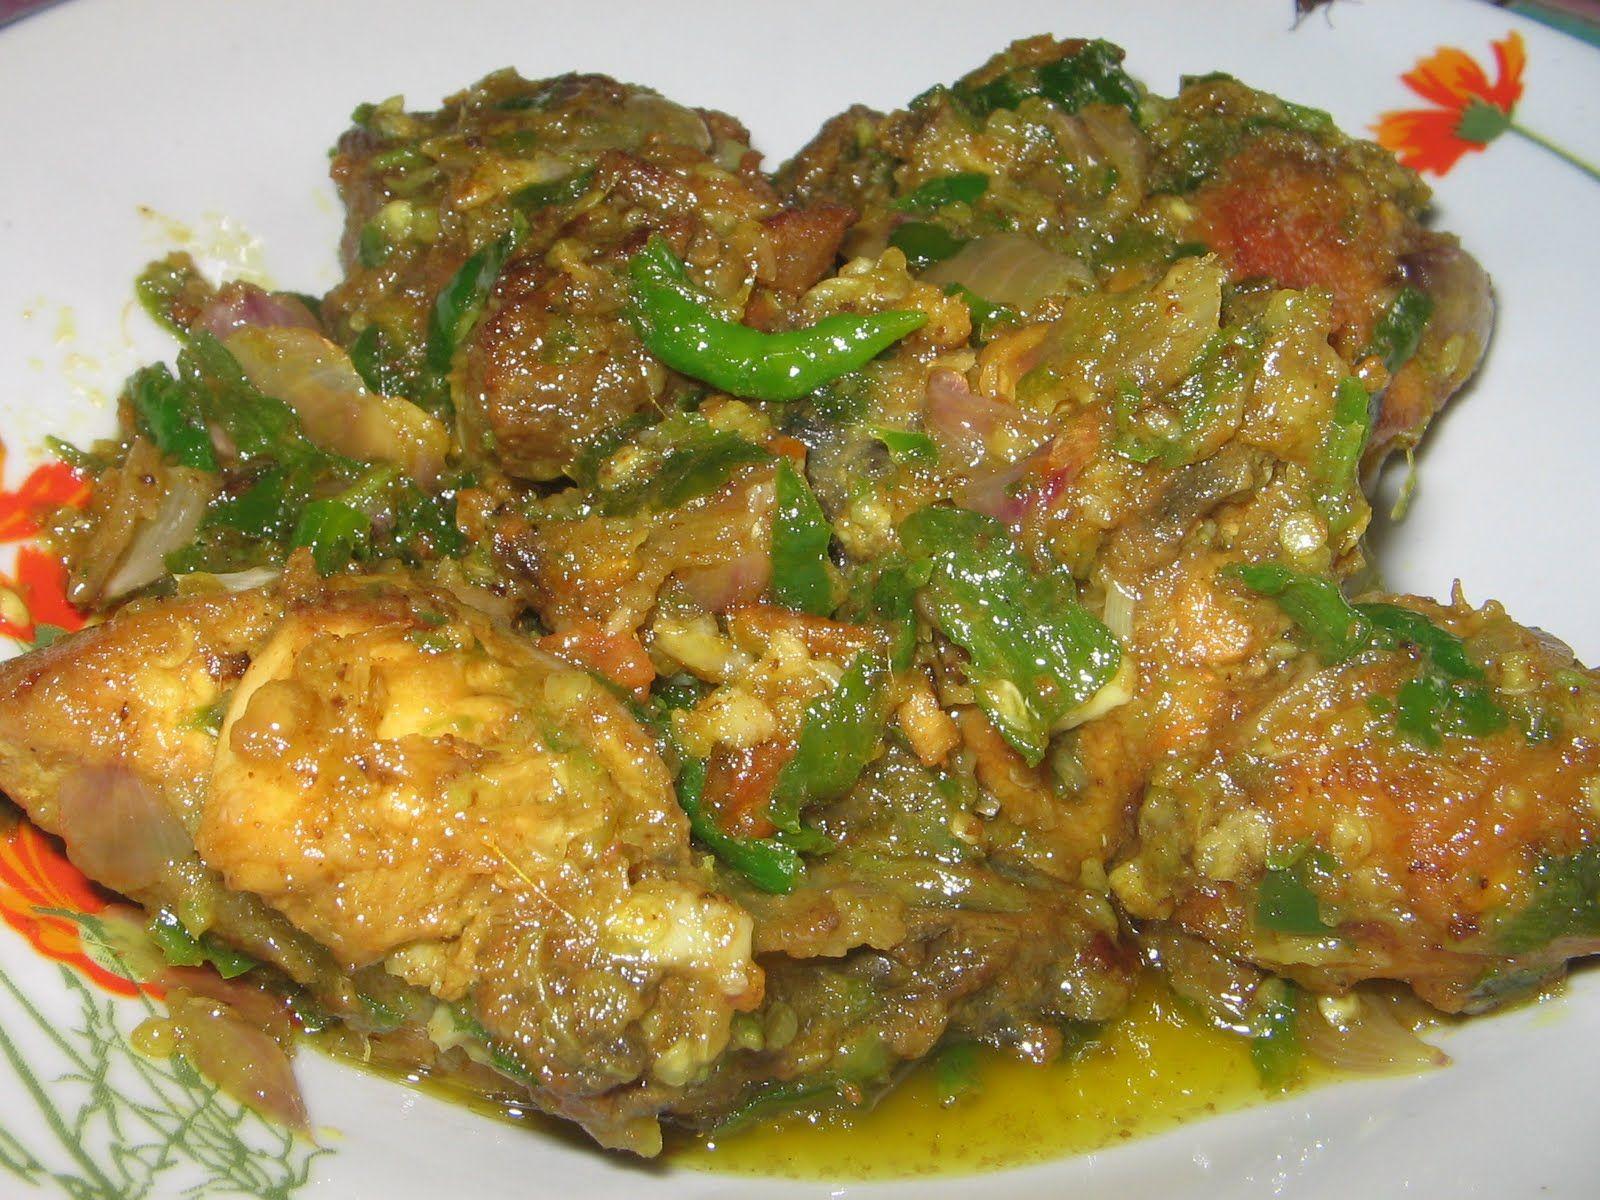 Resep Ayam Bumbu Cabe Ijo Resep Aneka Ayam Resep Ayam Resep Masakan Masakan